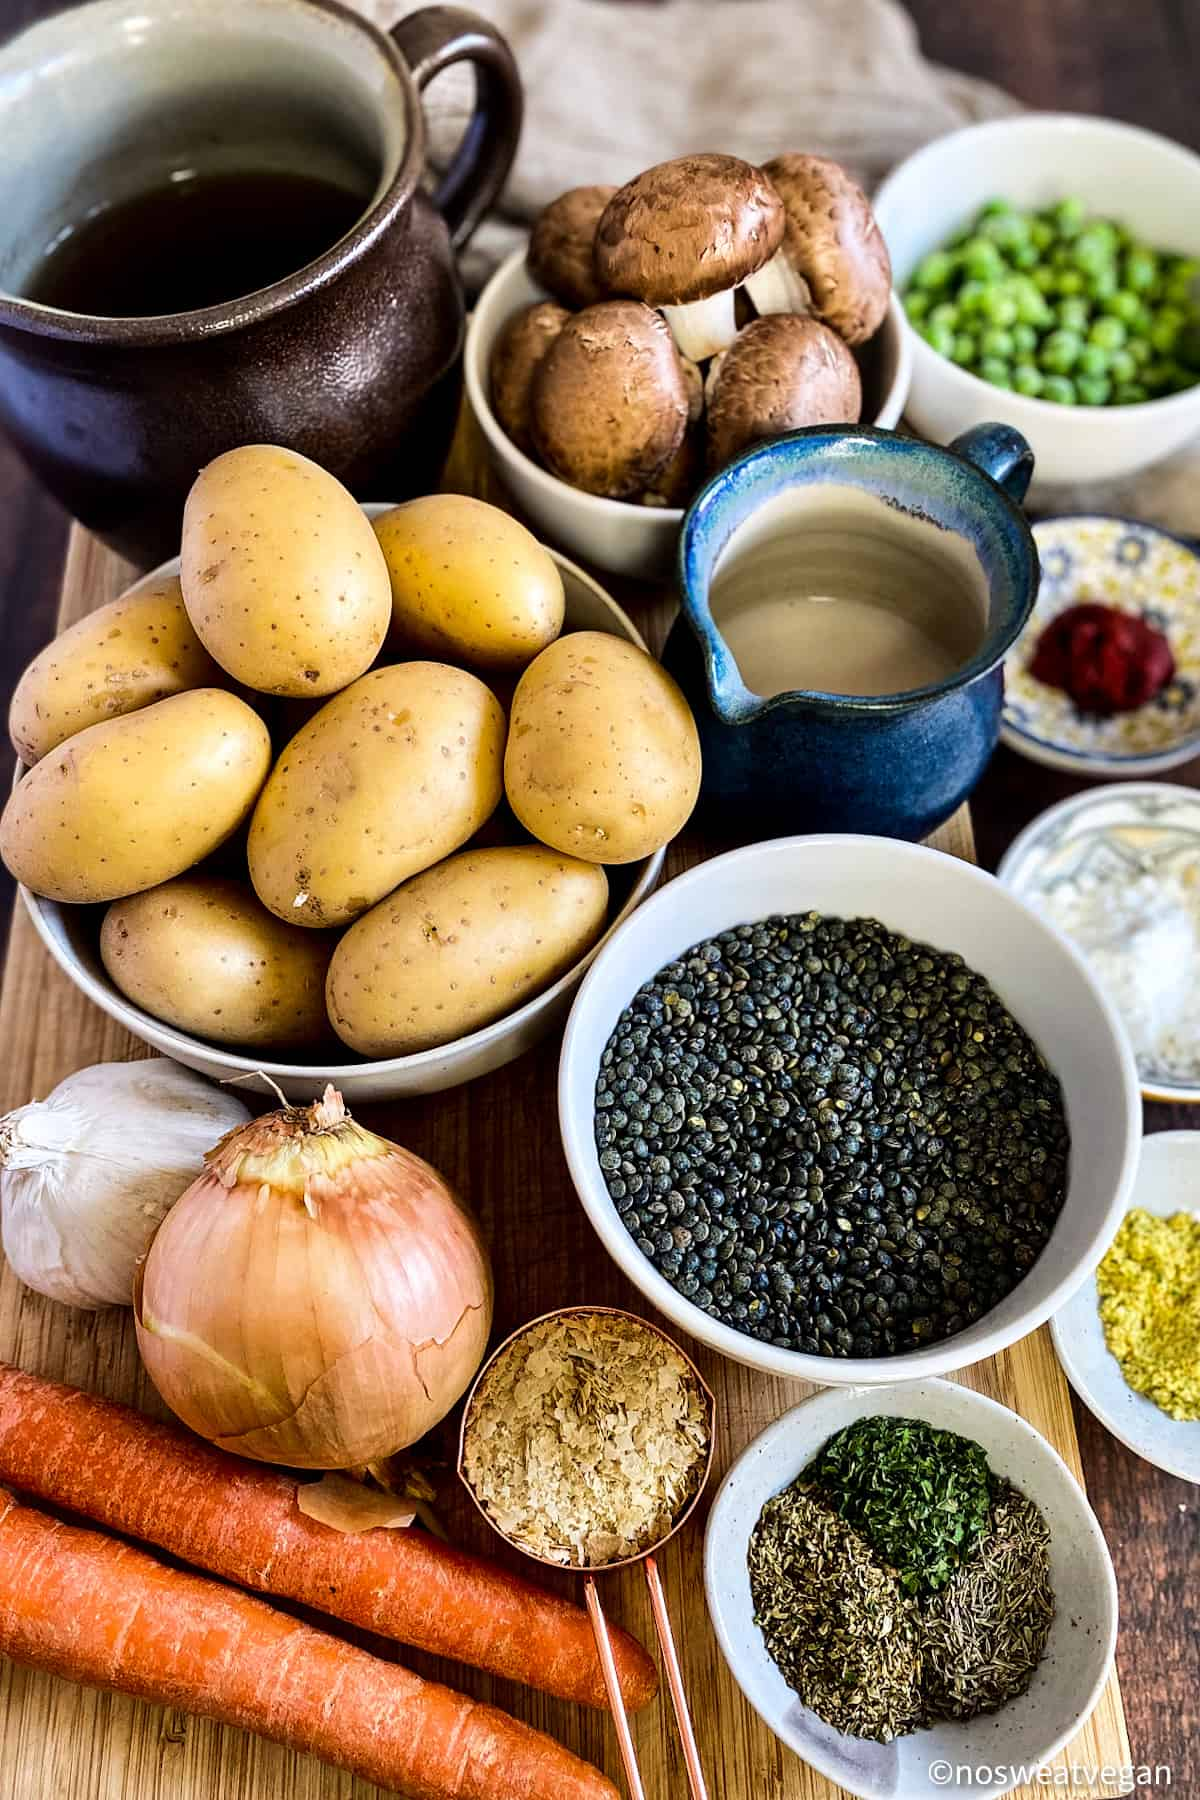 The ingredients for lentil shepherd's pie.